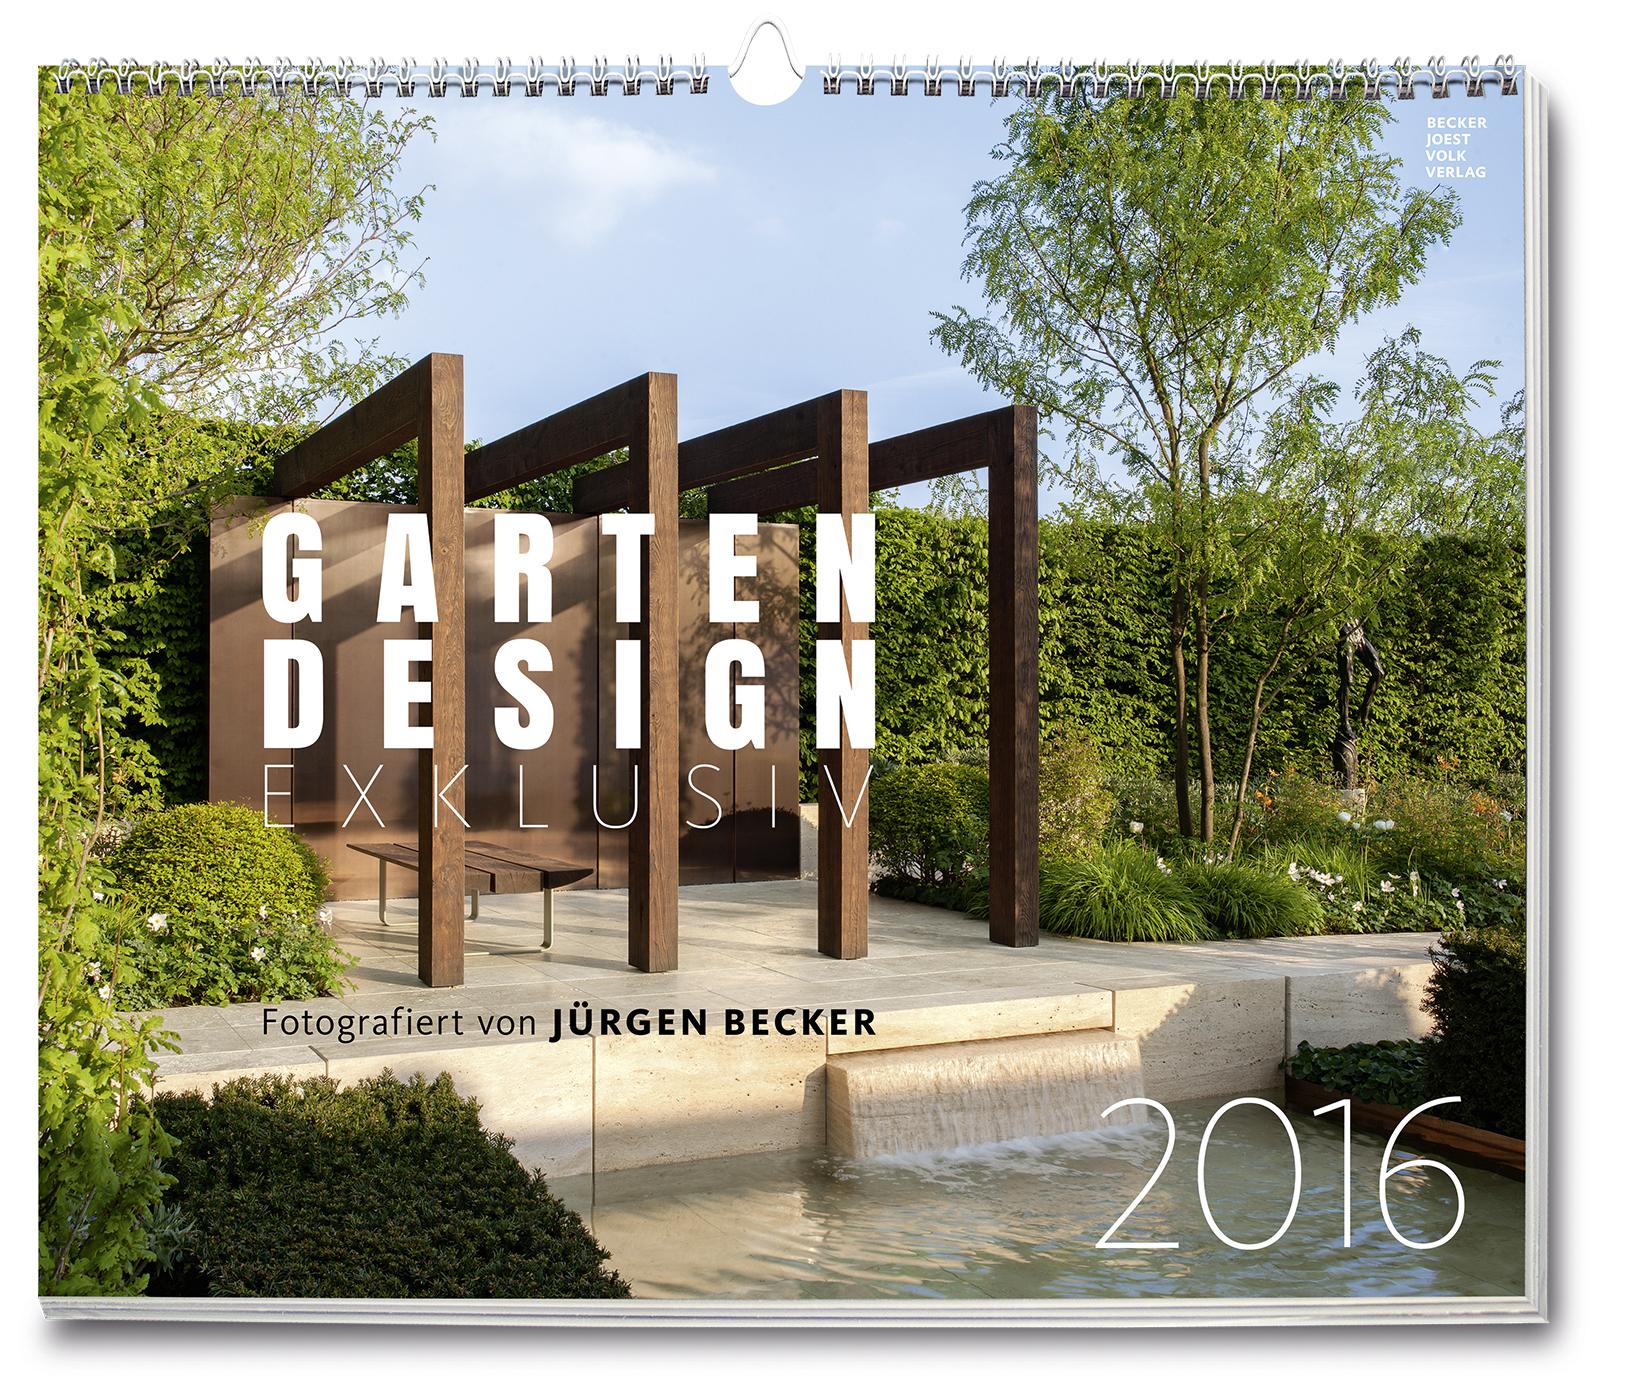 gartendesign-exklusiv_kalender2016_v1, Terrassen ideen